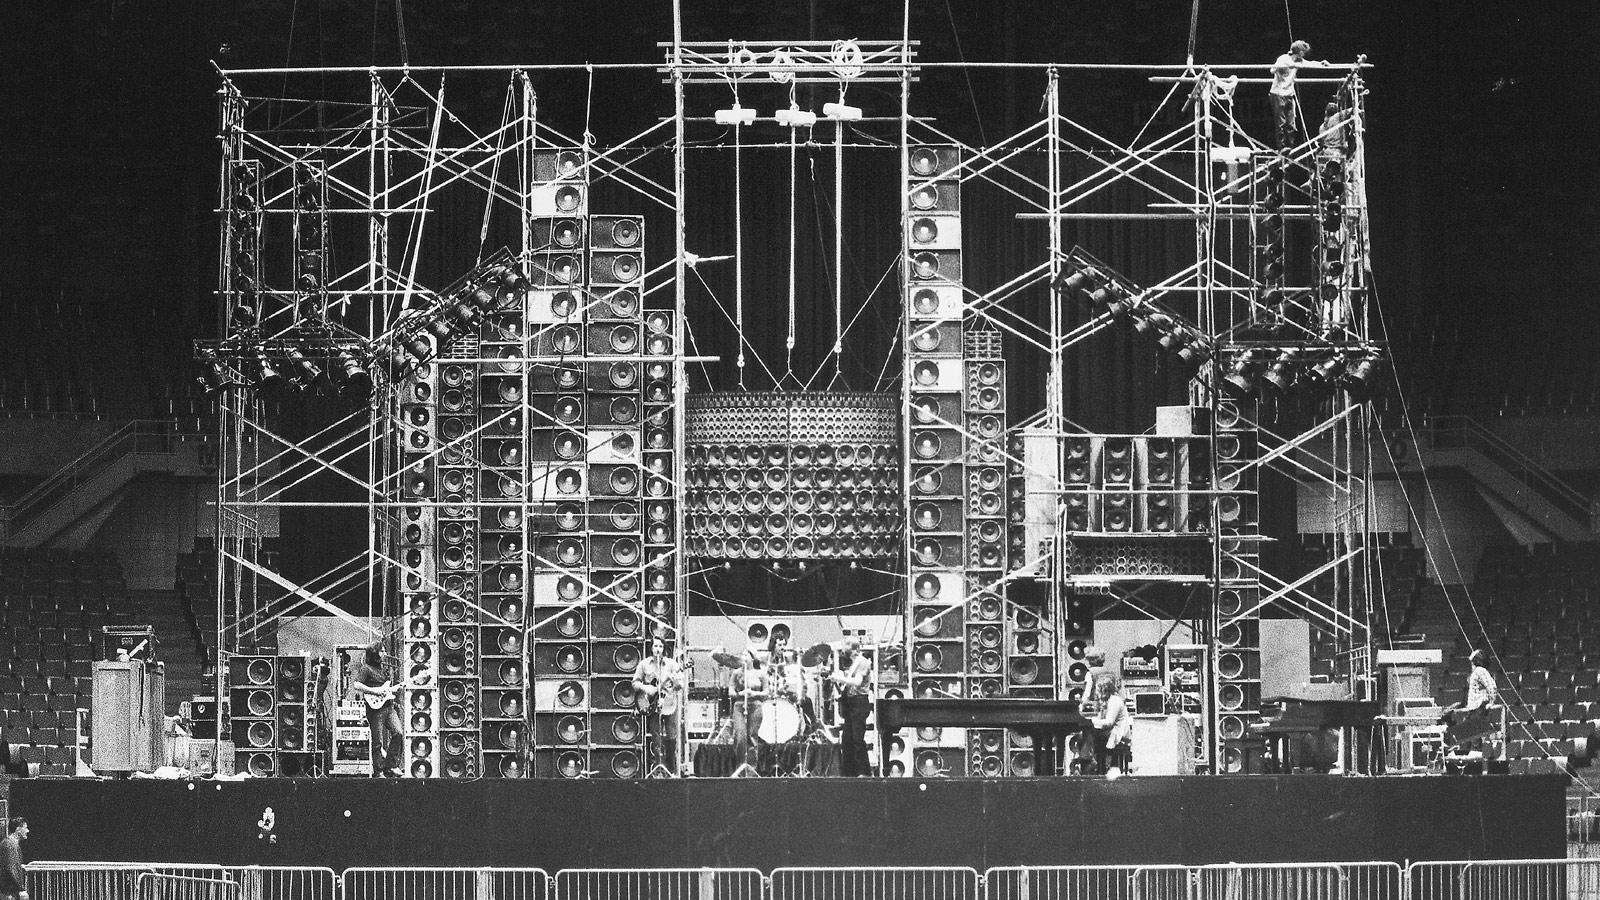 full_1972_wall_of_sound.jpg